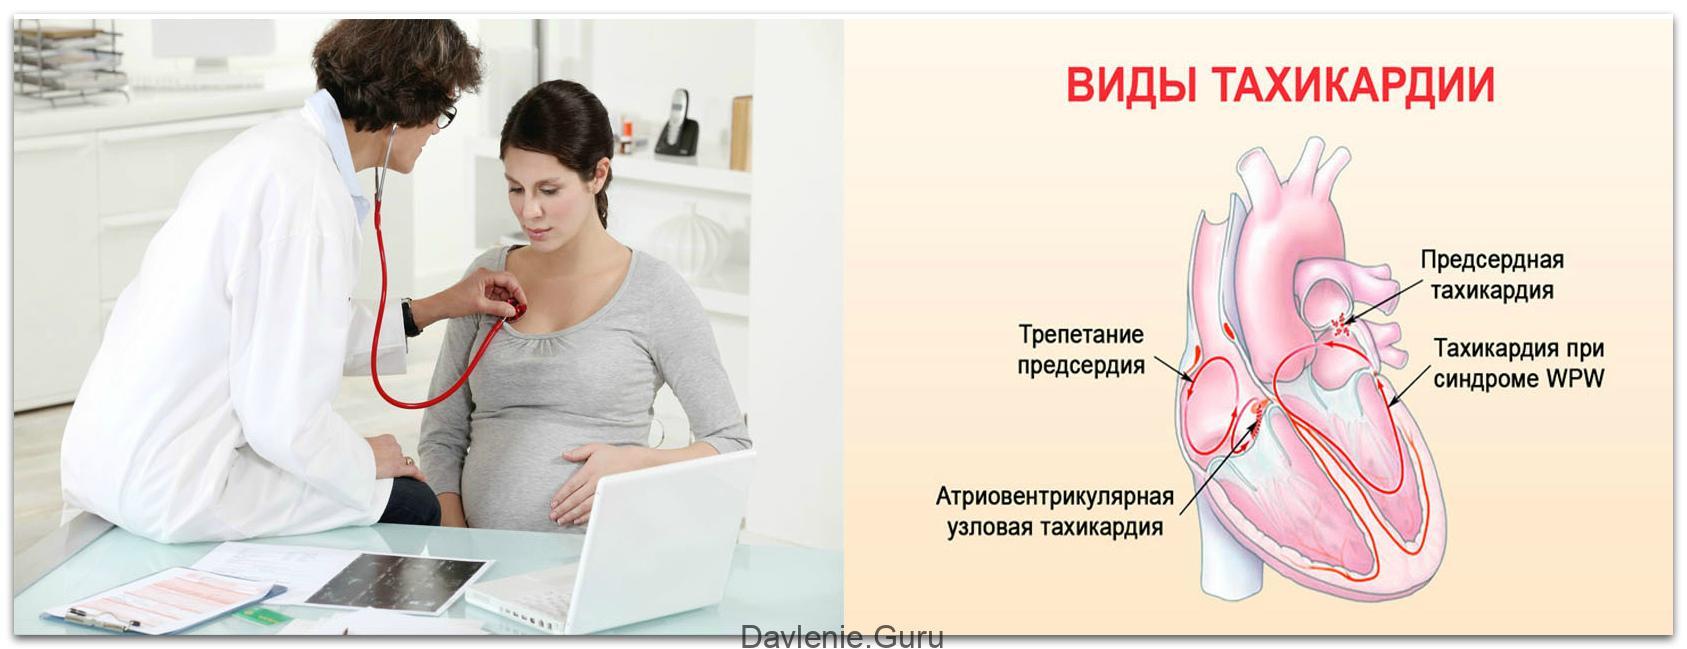 Тахикардия плода при беременности